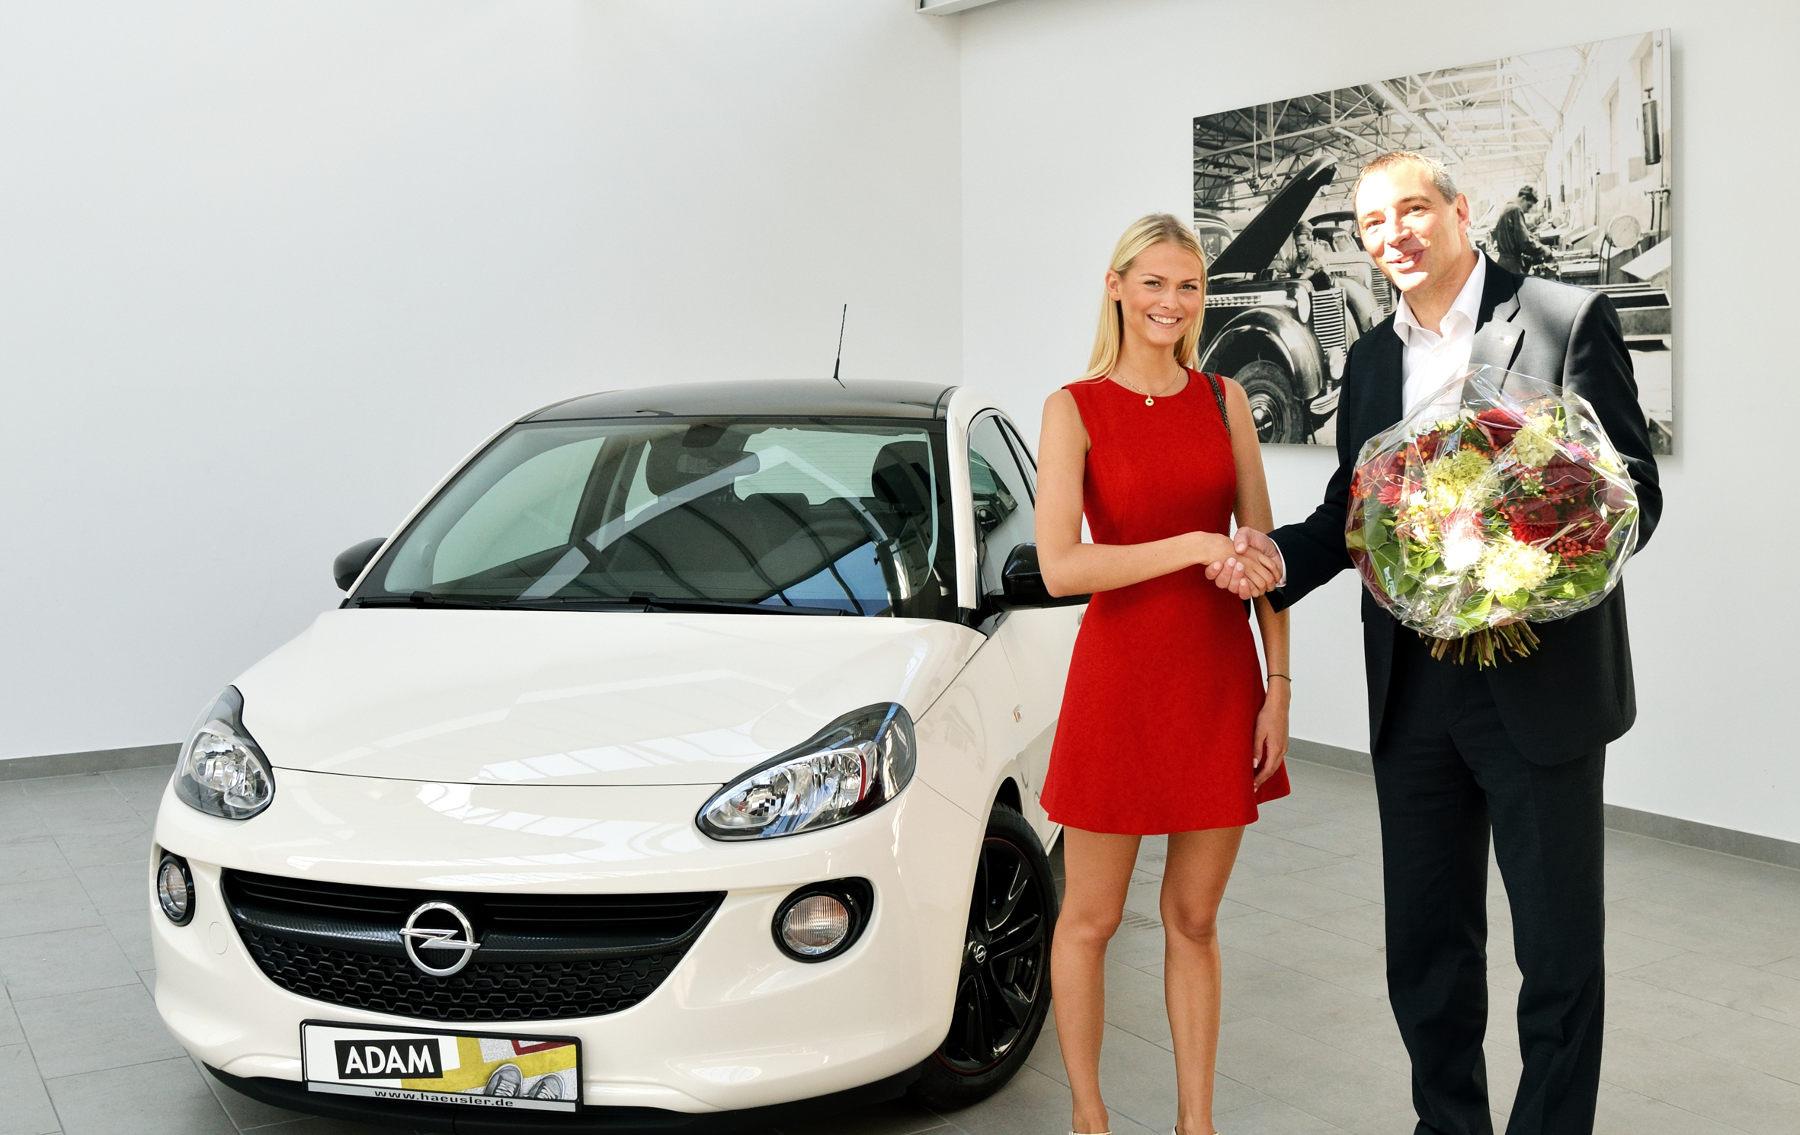 news-details häusler automobil gmbh & co. kg